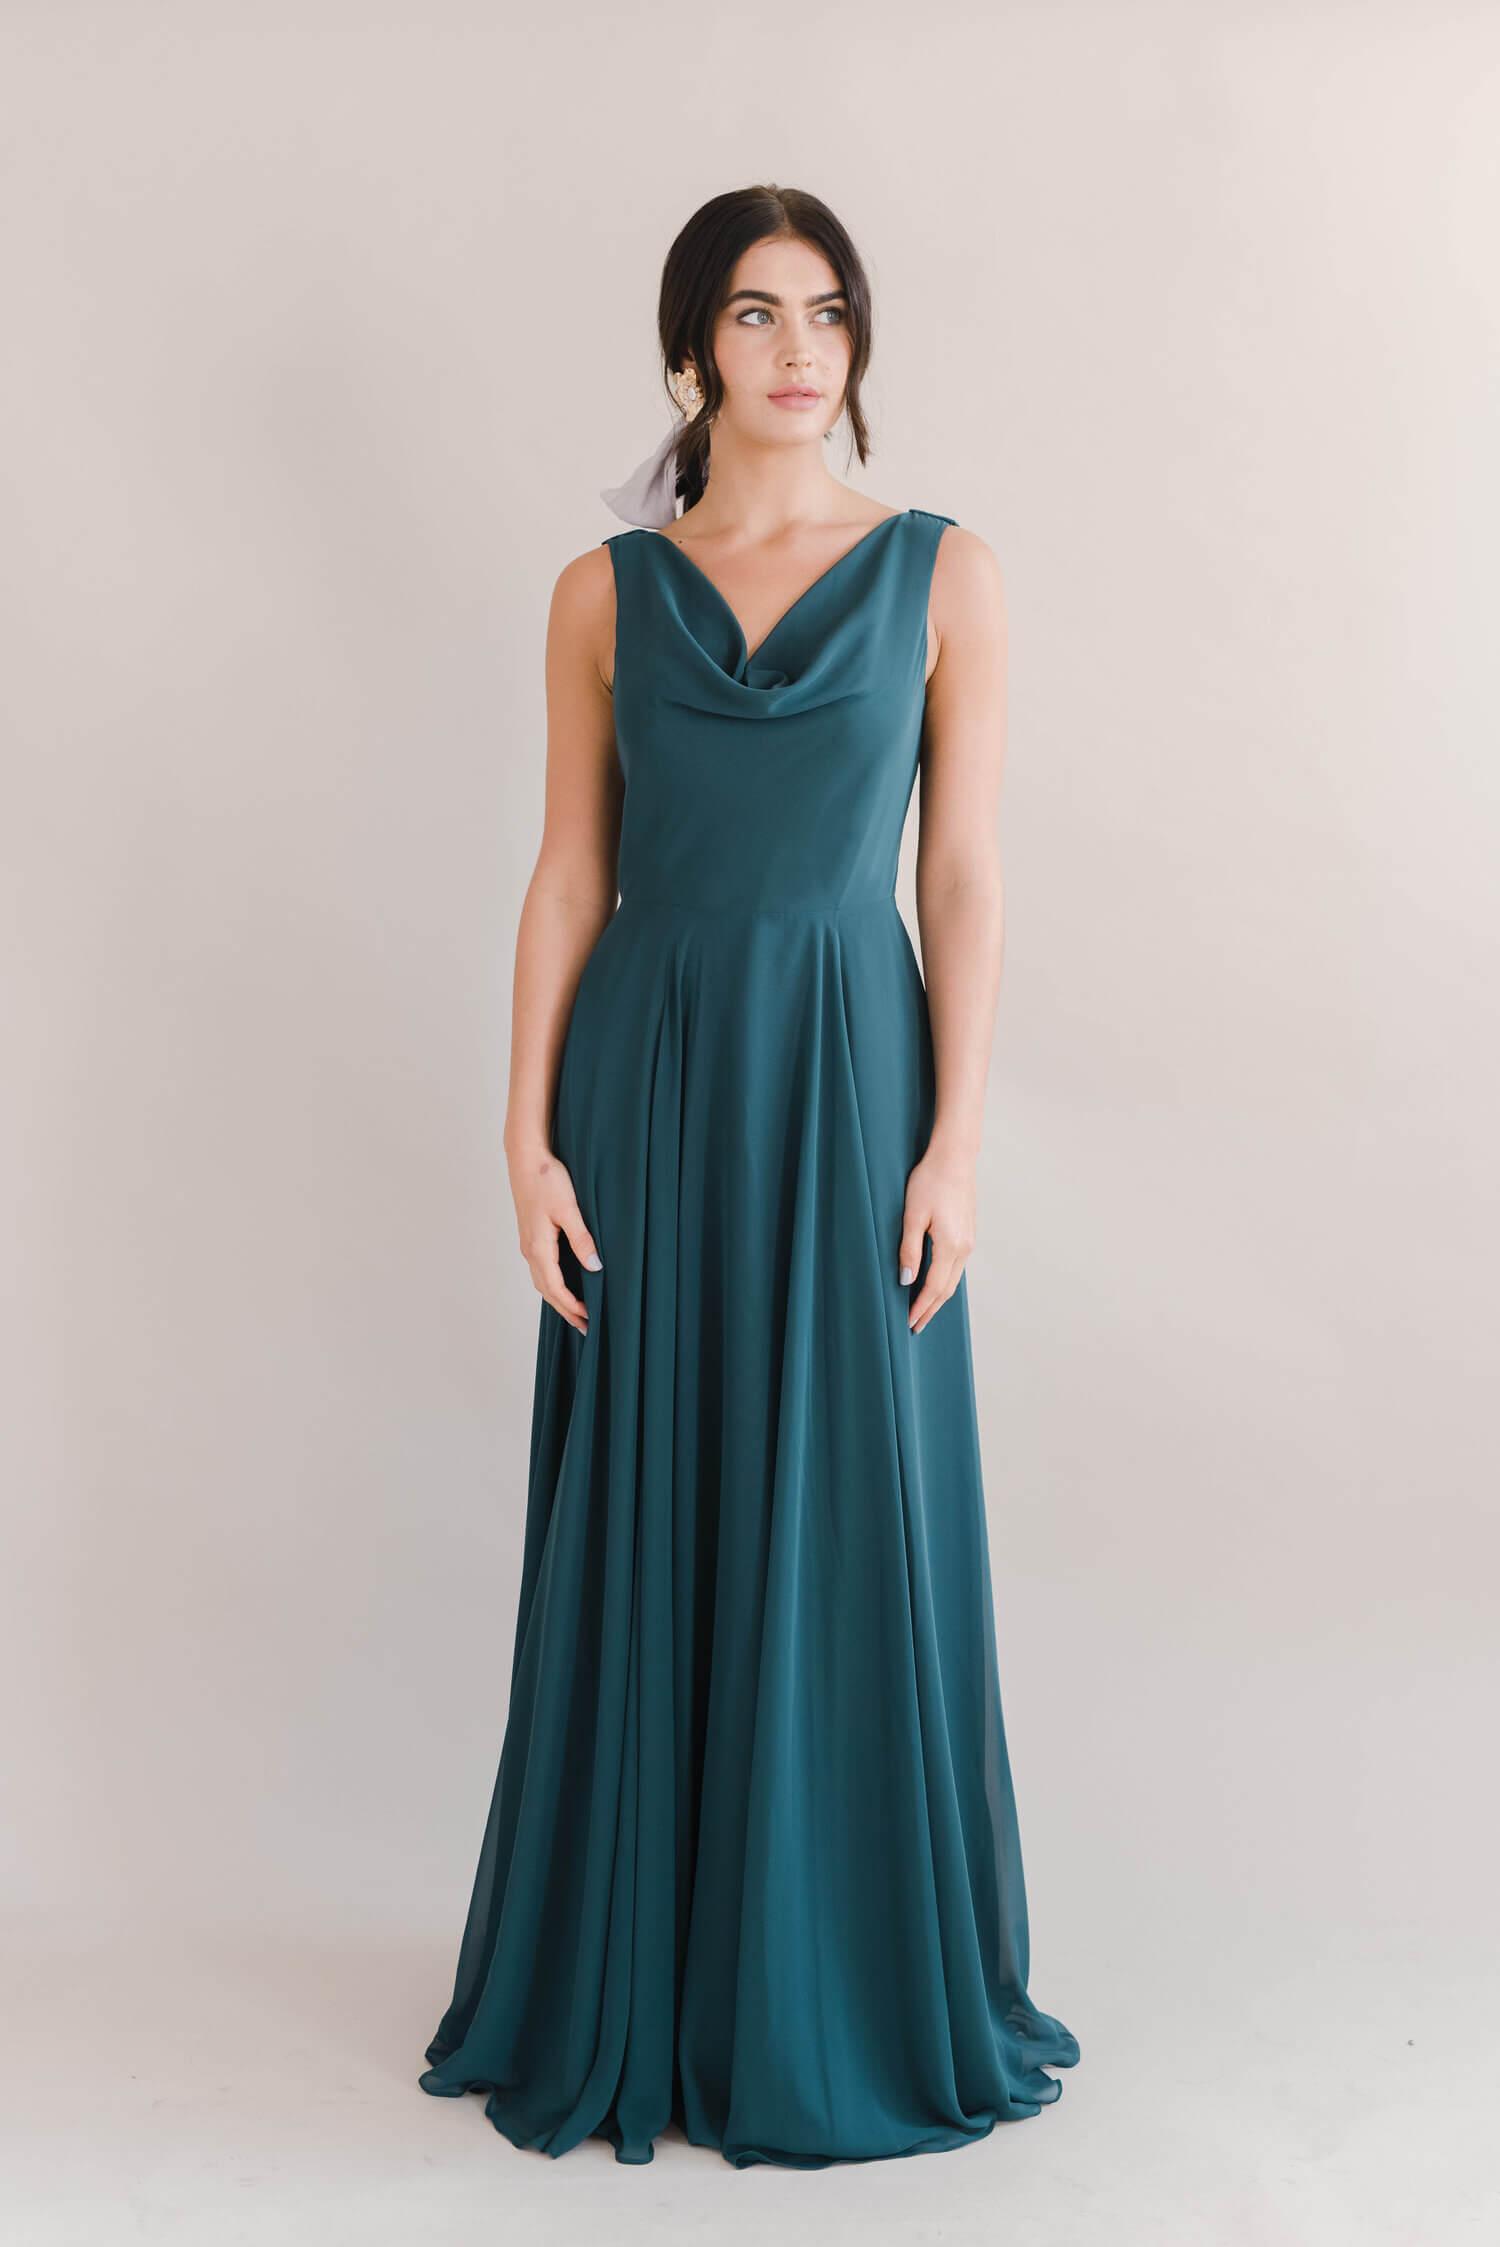 TH&H Athena Bridesmaid Dress Emerald